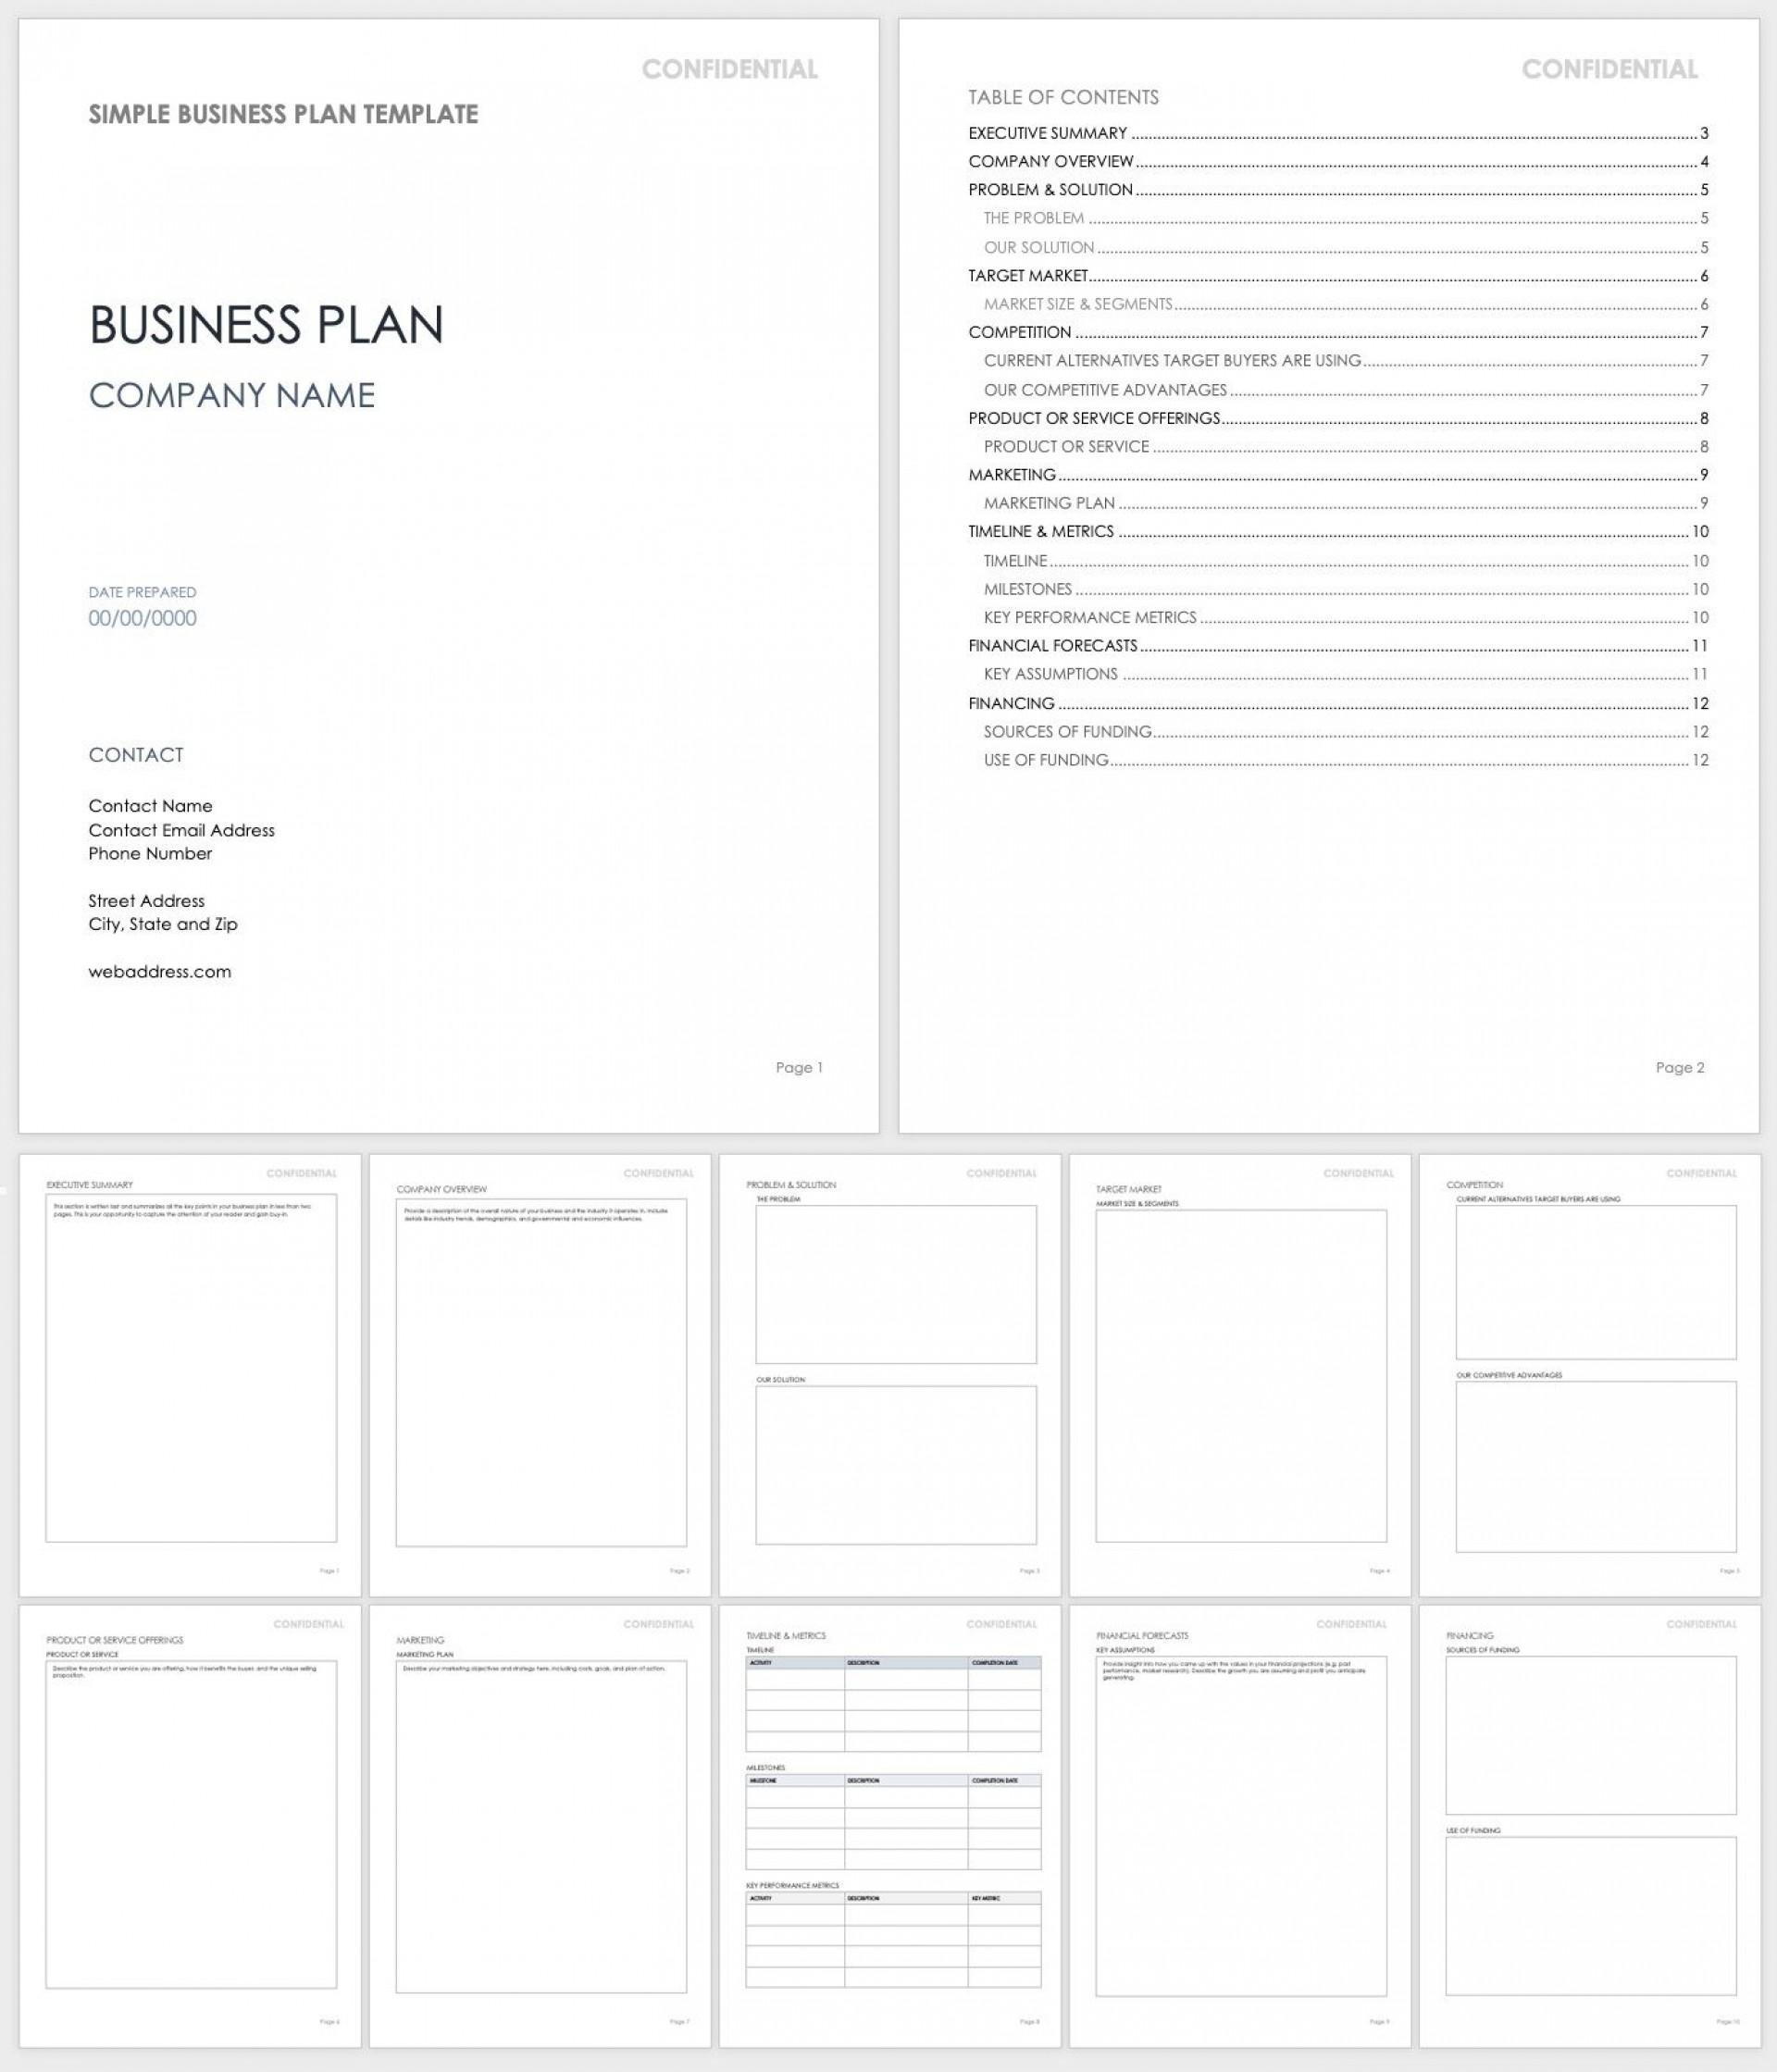 007 Shocking Basic Busines Plan Template High Resolution  Simple Word Download Easy Free Australia1920